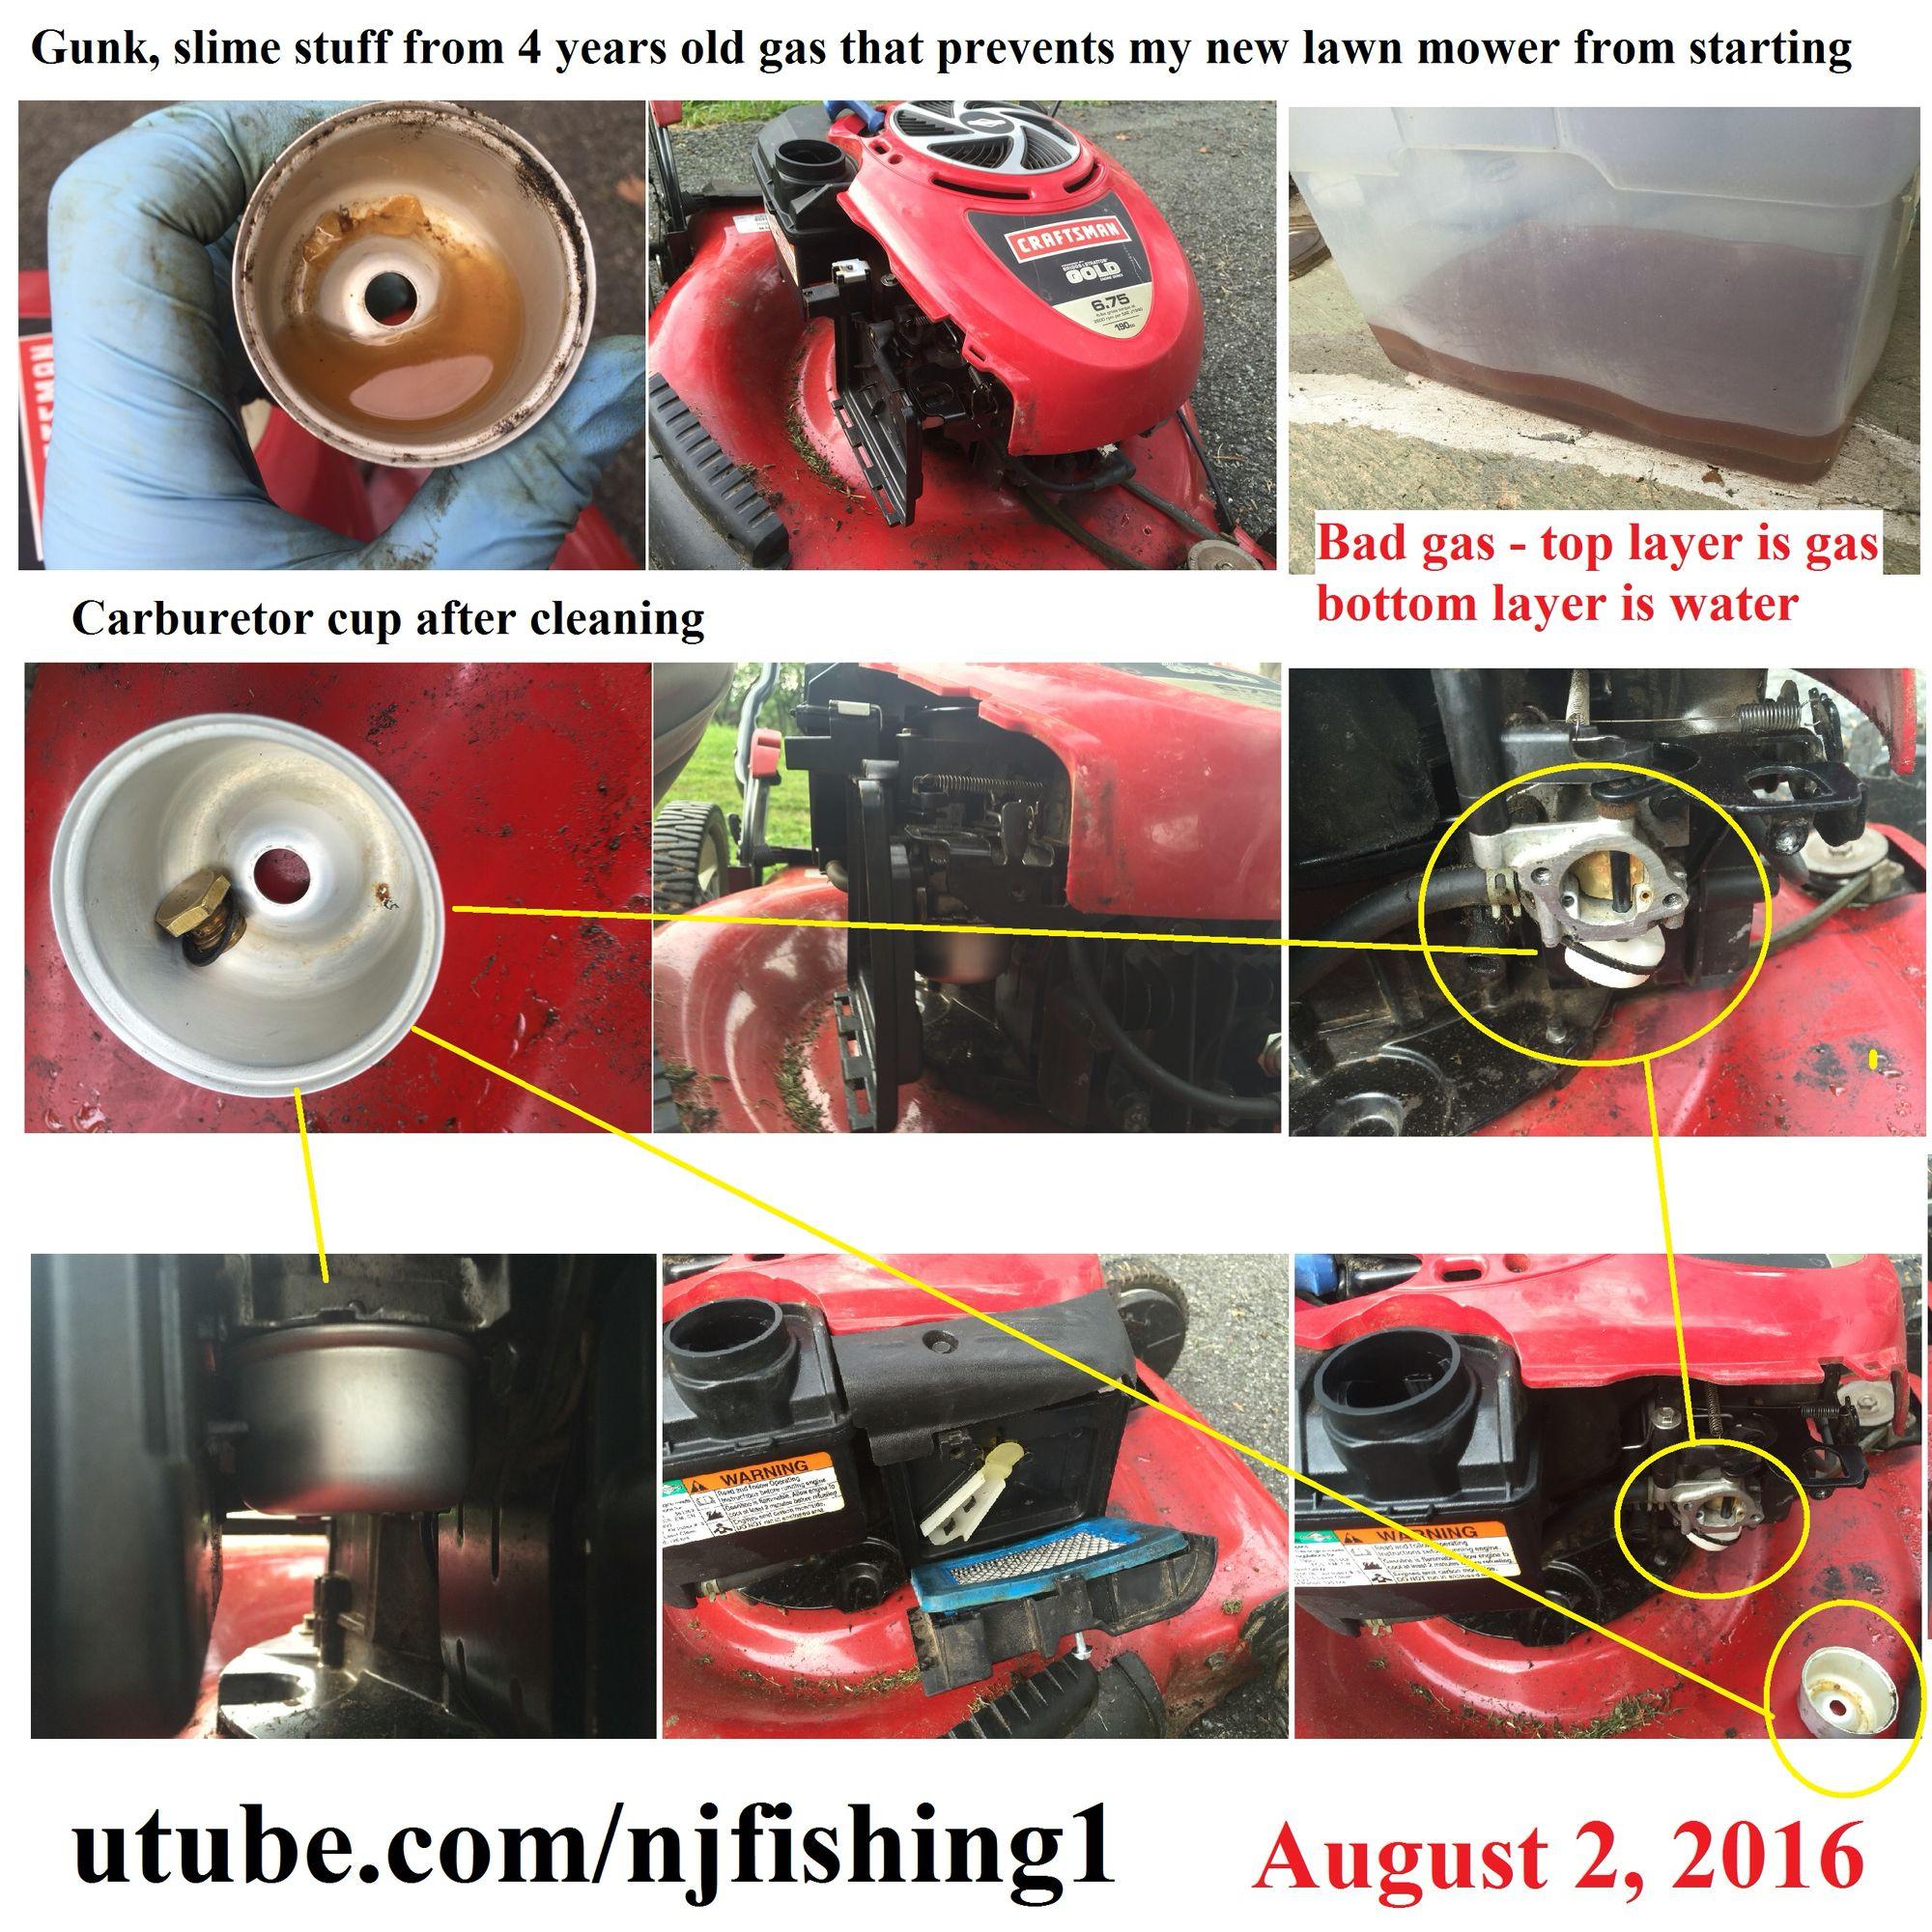 Craftsman Briggsandstratton Lawnmower Won Tstart Diyfix By Cleaning The Carburetorcup Badfuel With Gunk And Water Sittin Lawn Mower Lawn Care Cleaning